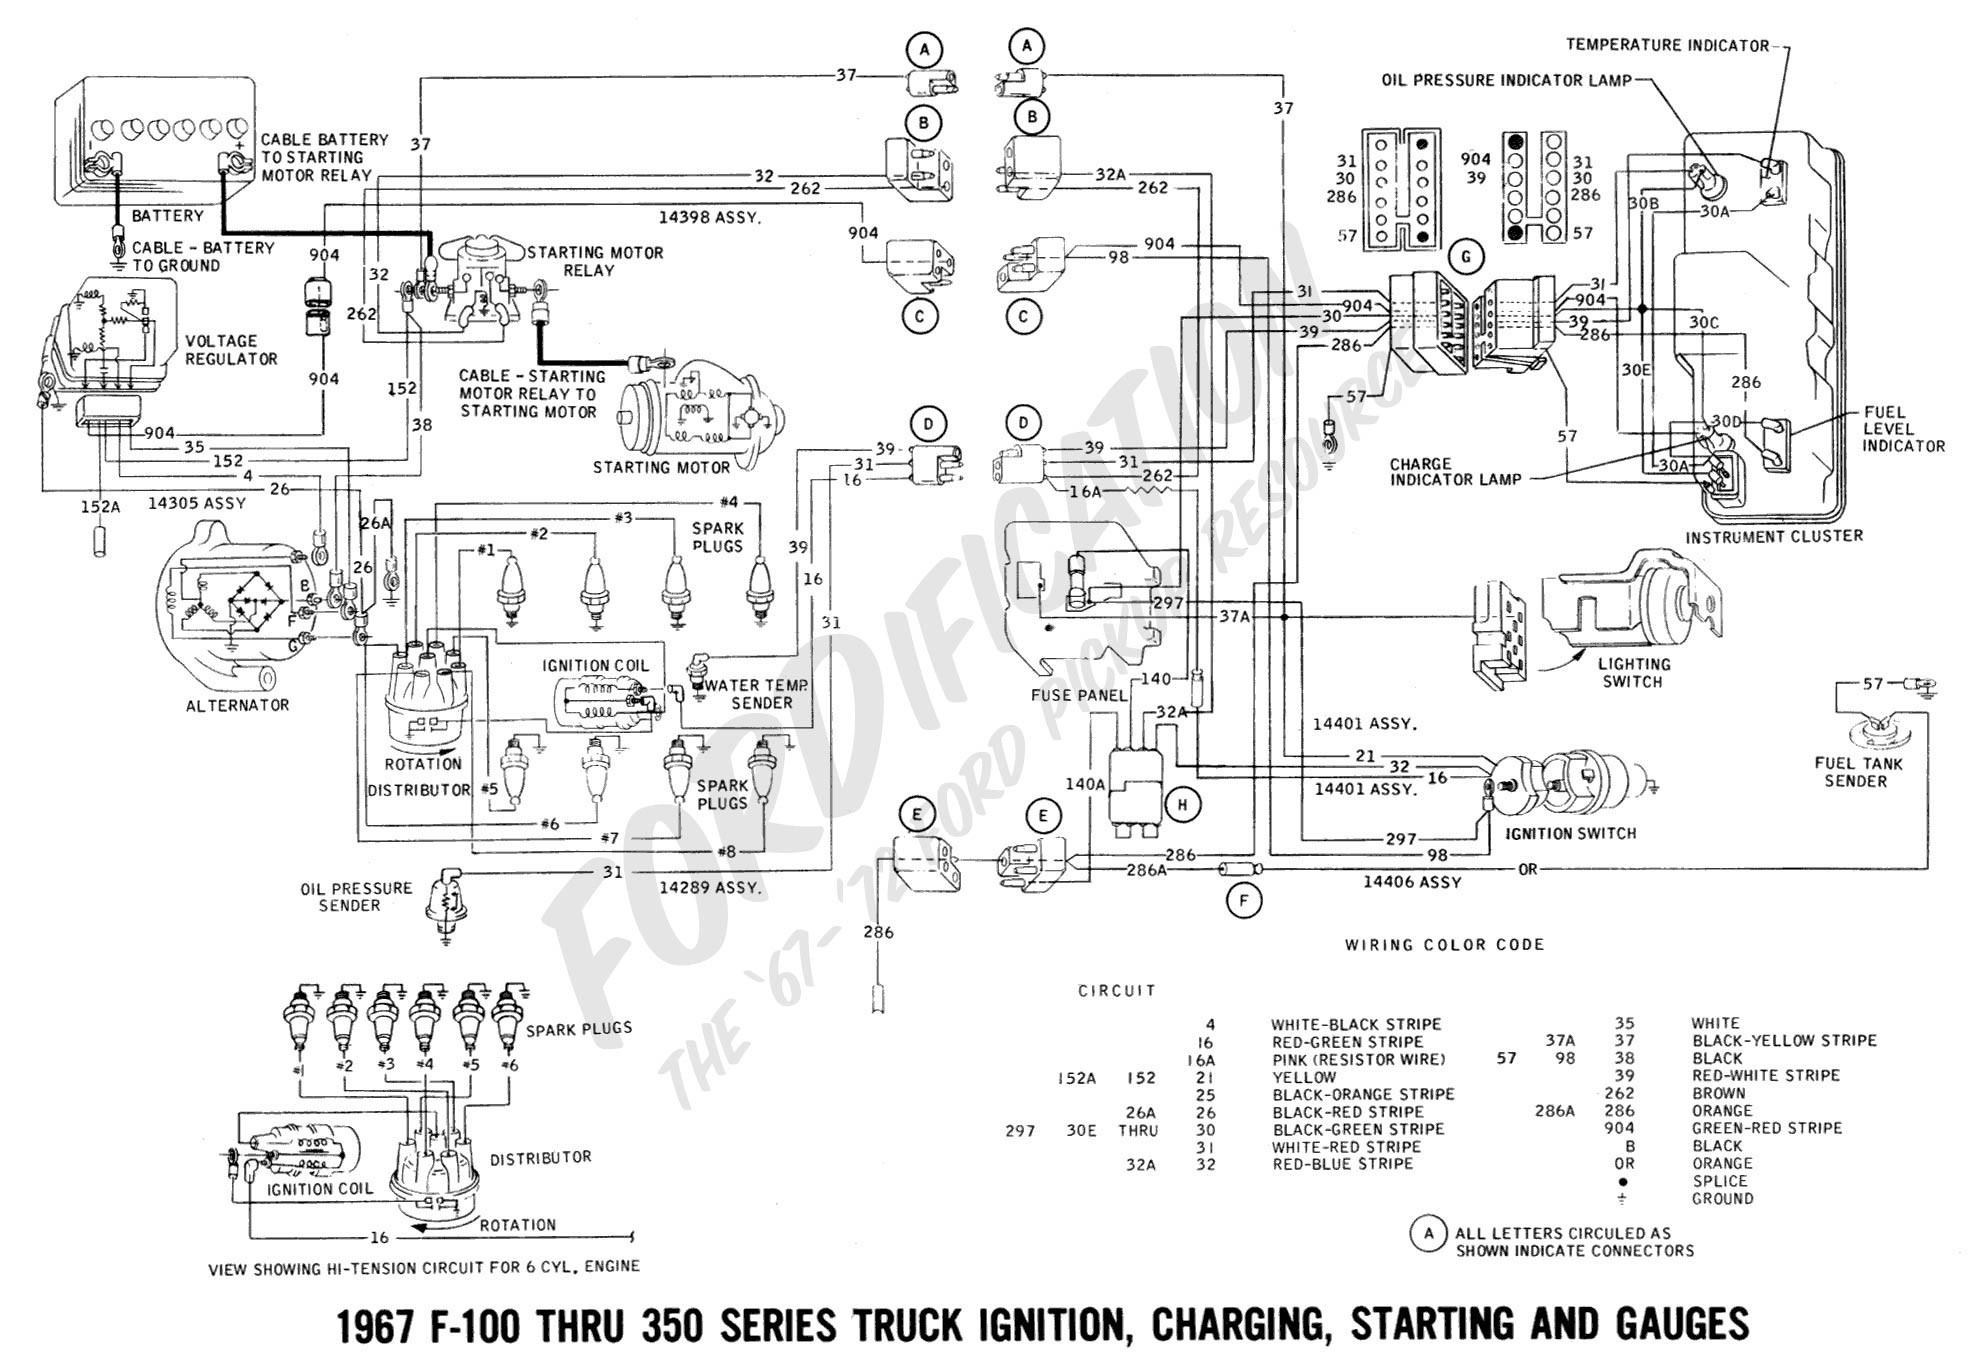 1969 Ford Wiring | Wiring Diagram - Model A Ford Wiring Diagram